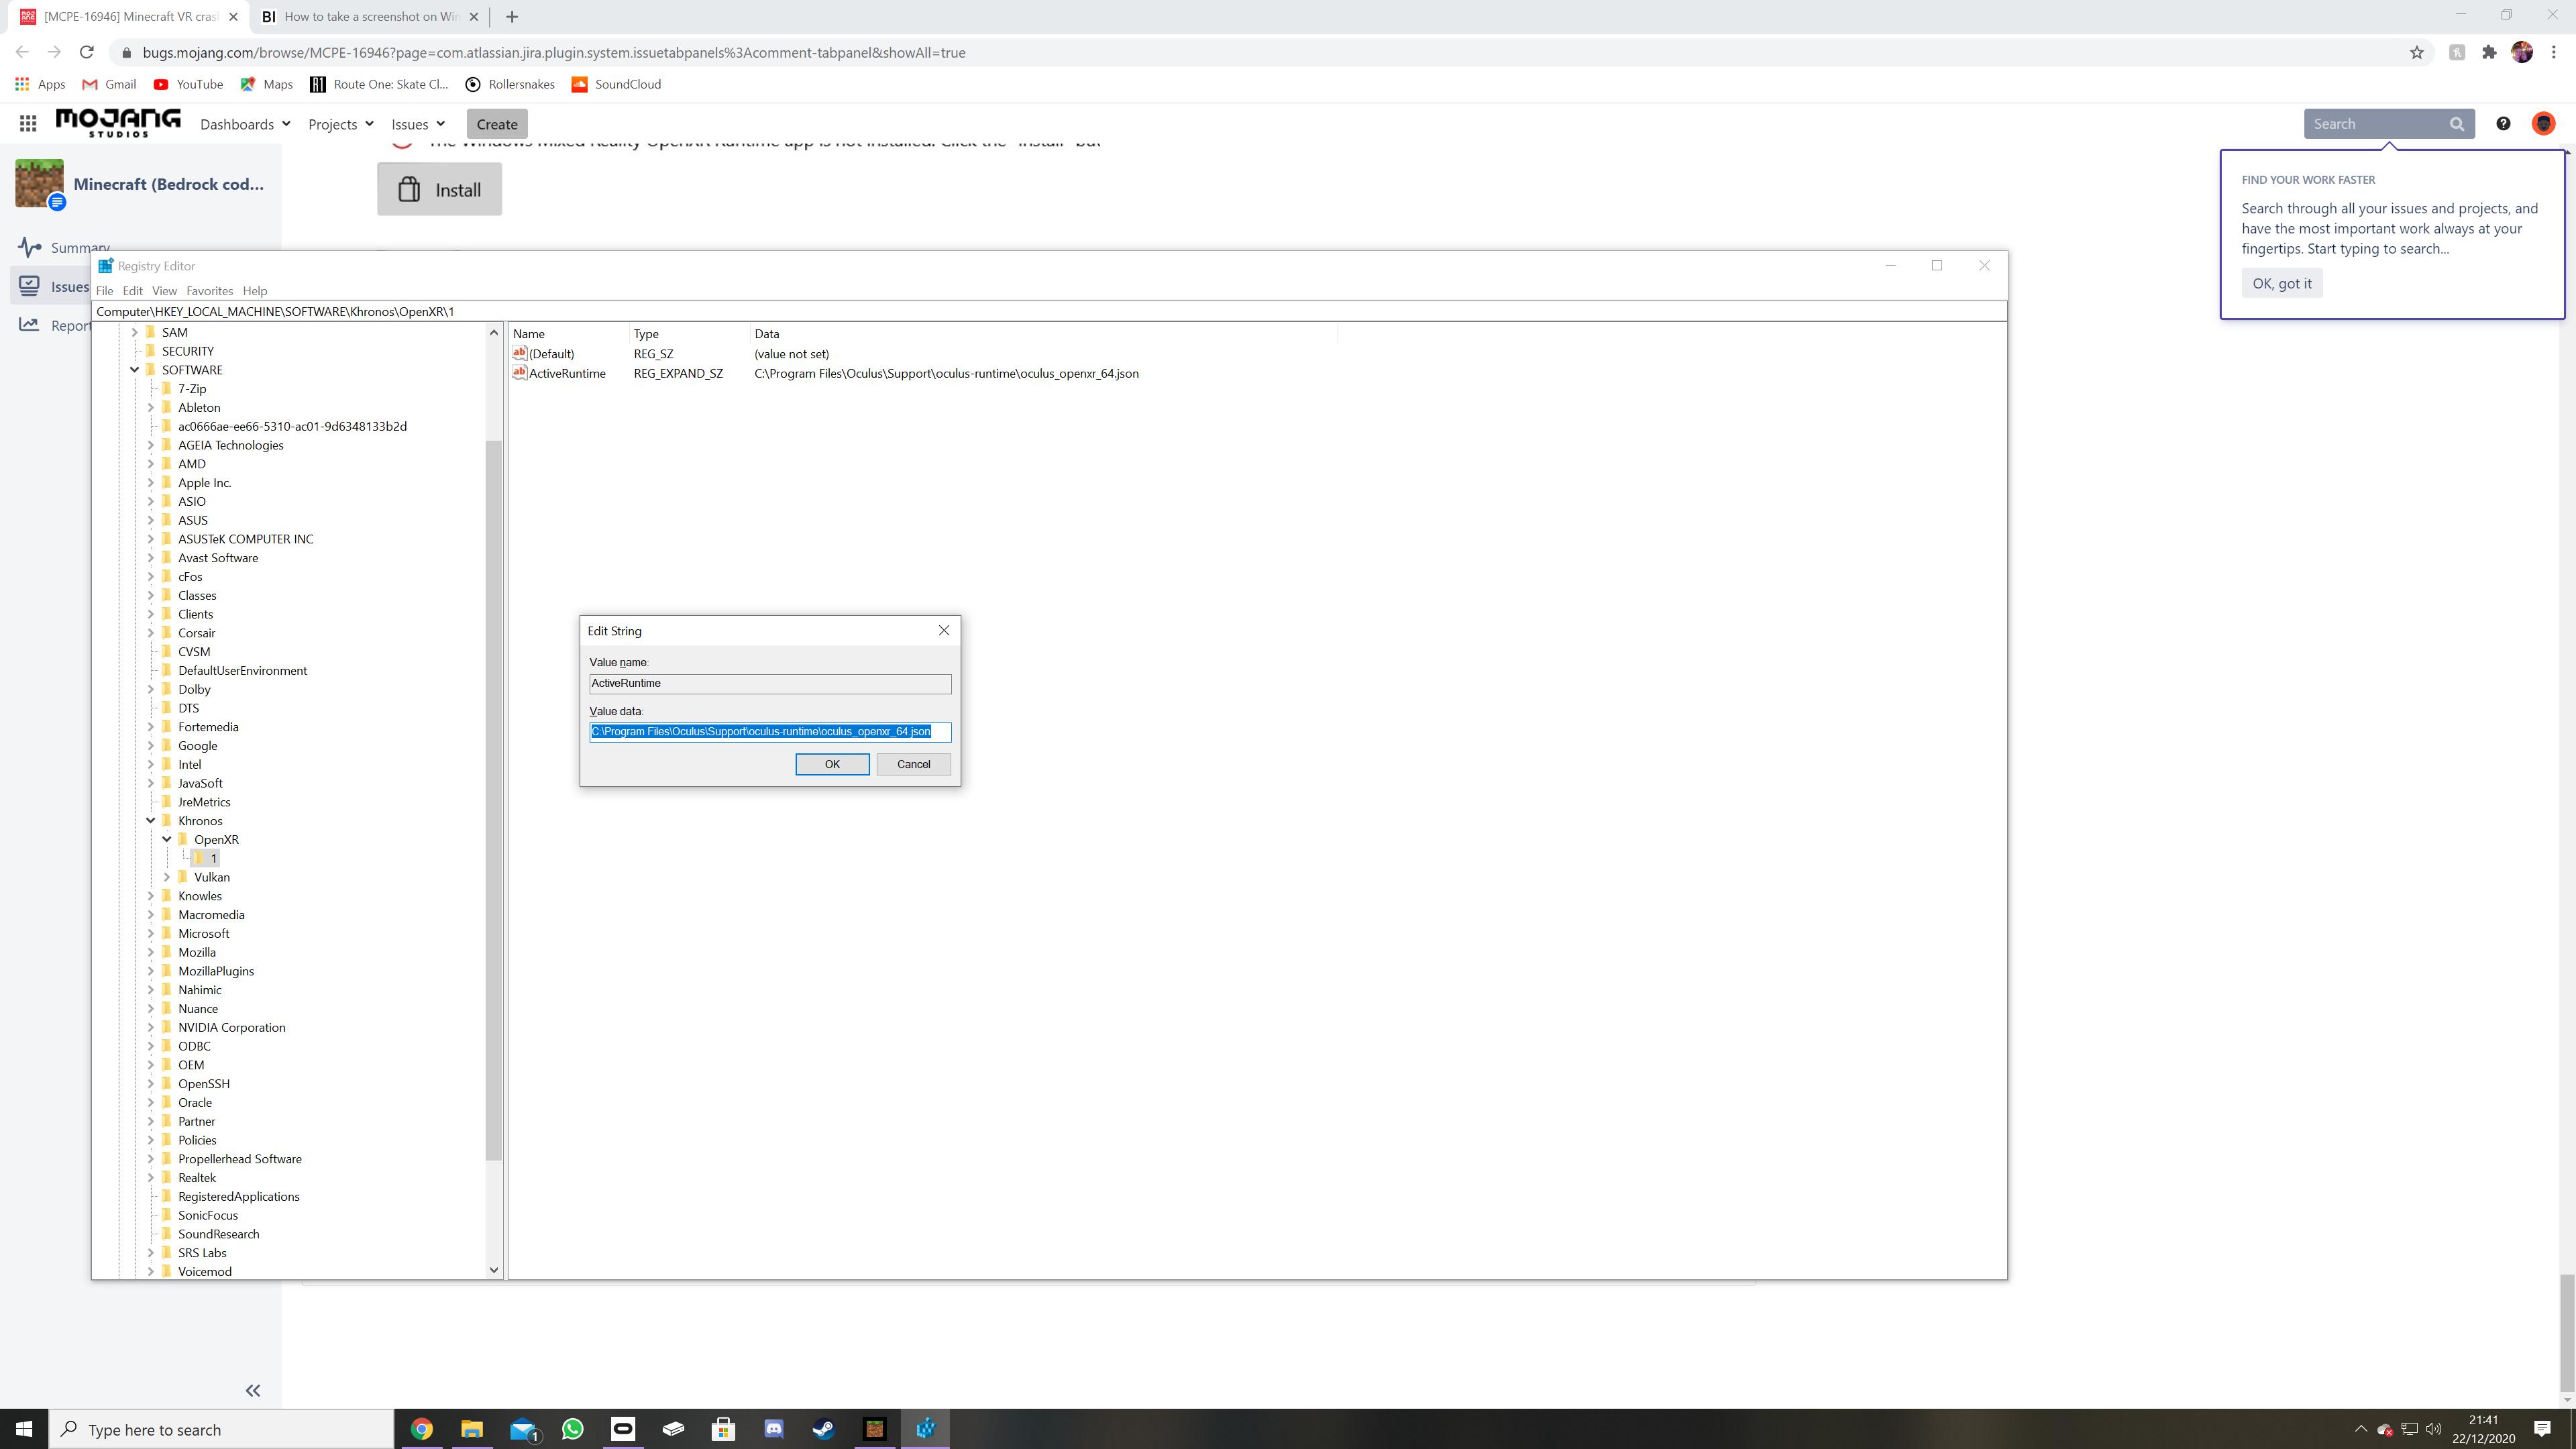 MCPE-12] Minecraft VR crashes at loading screen - Jira